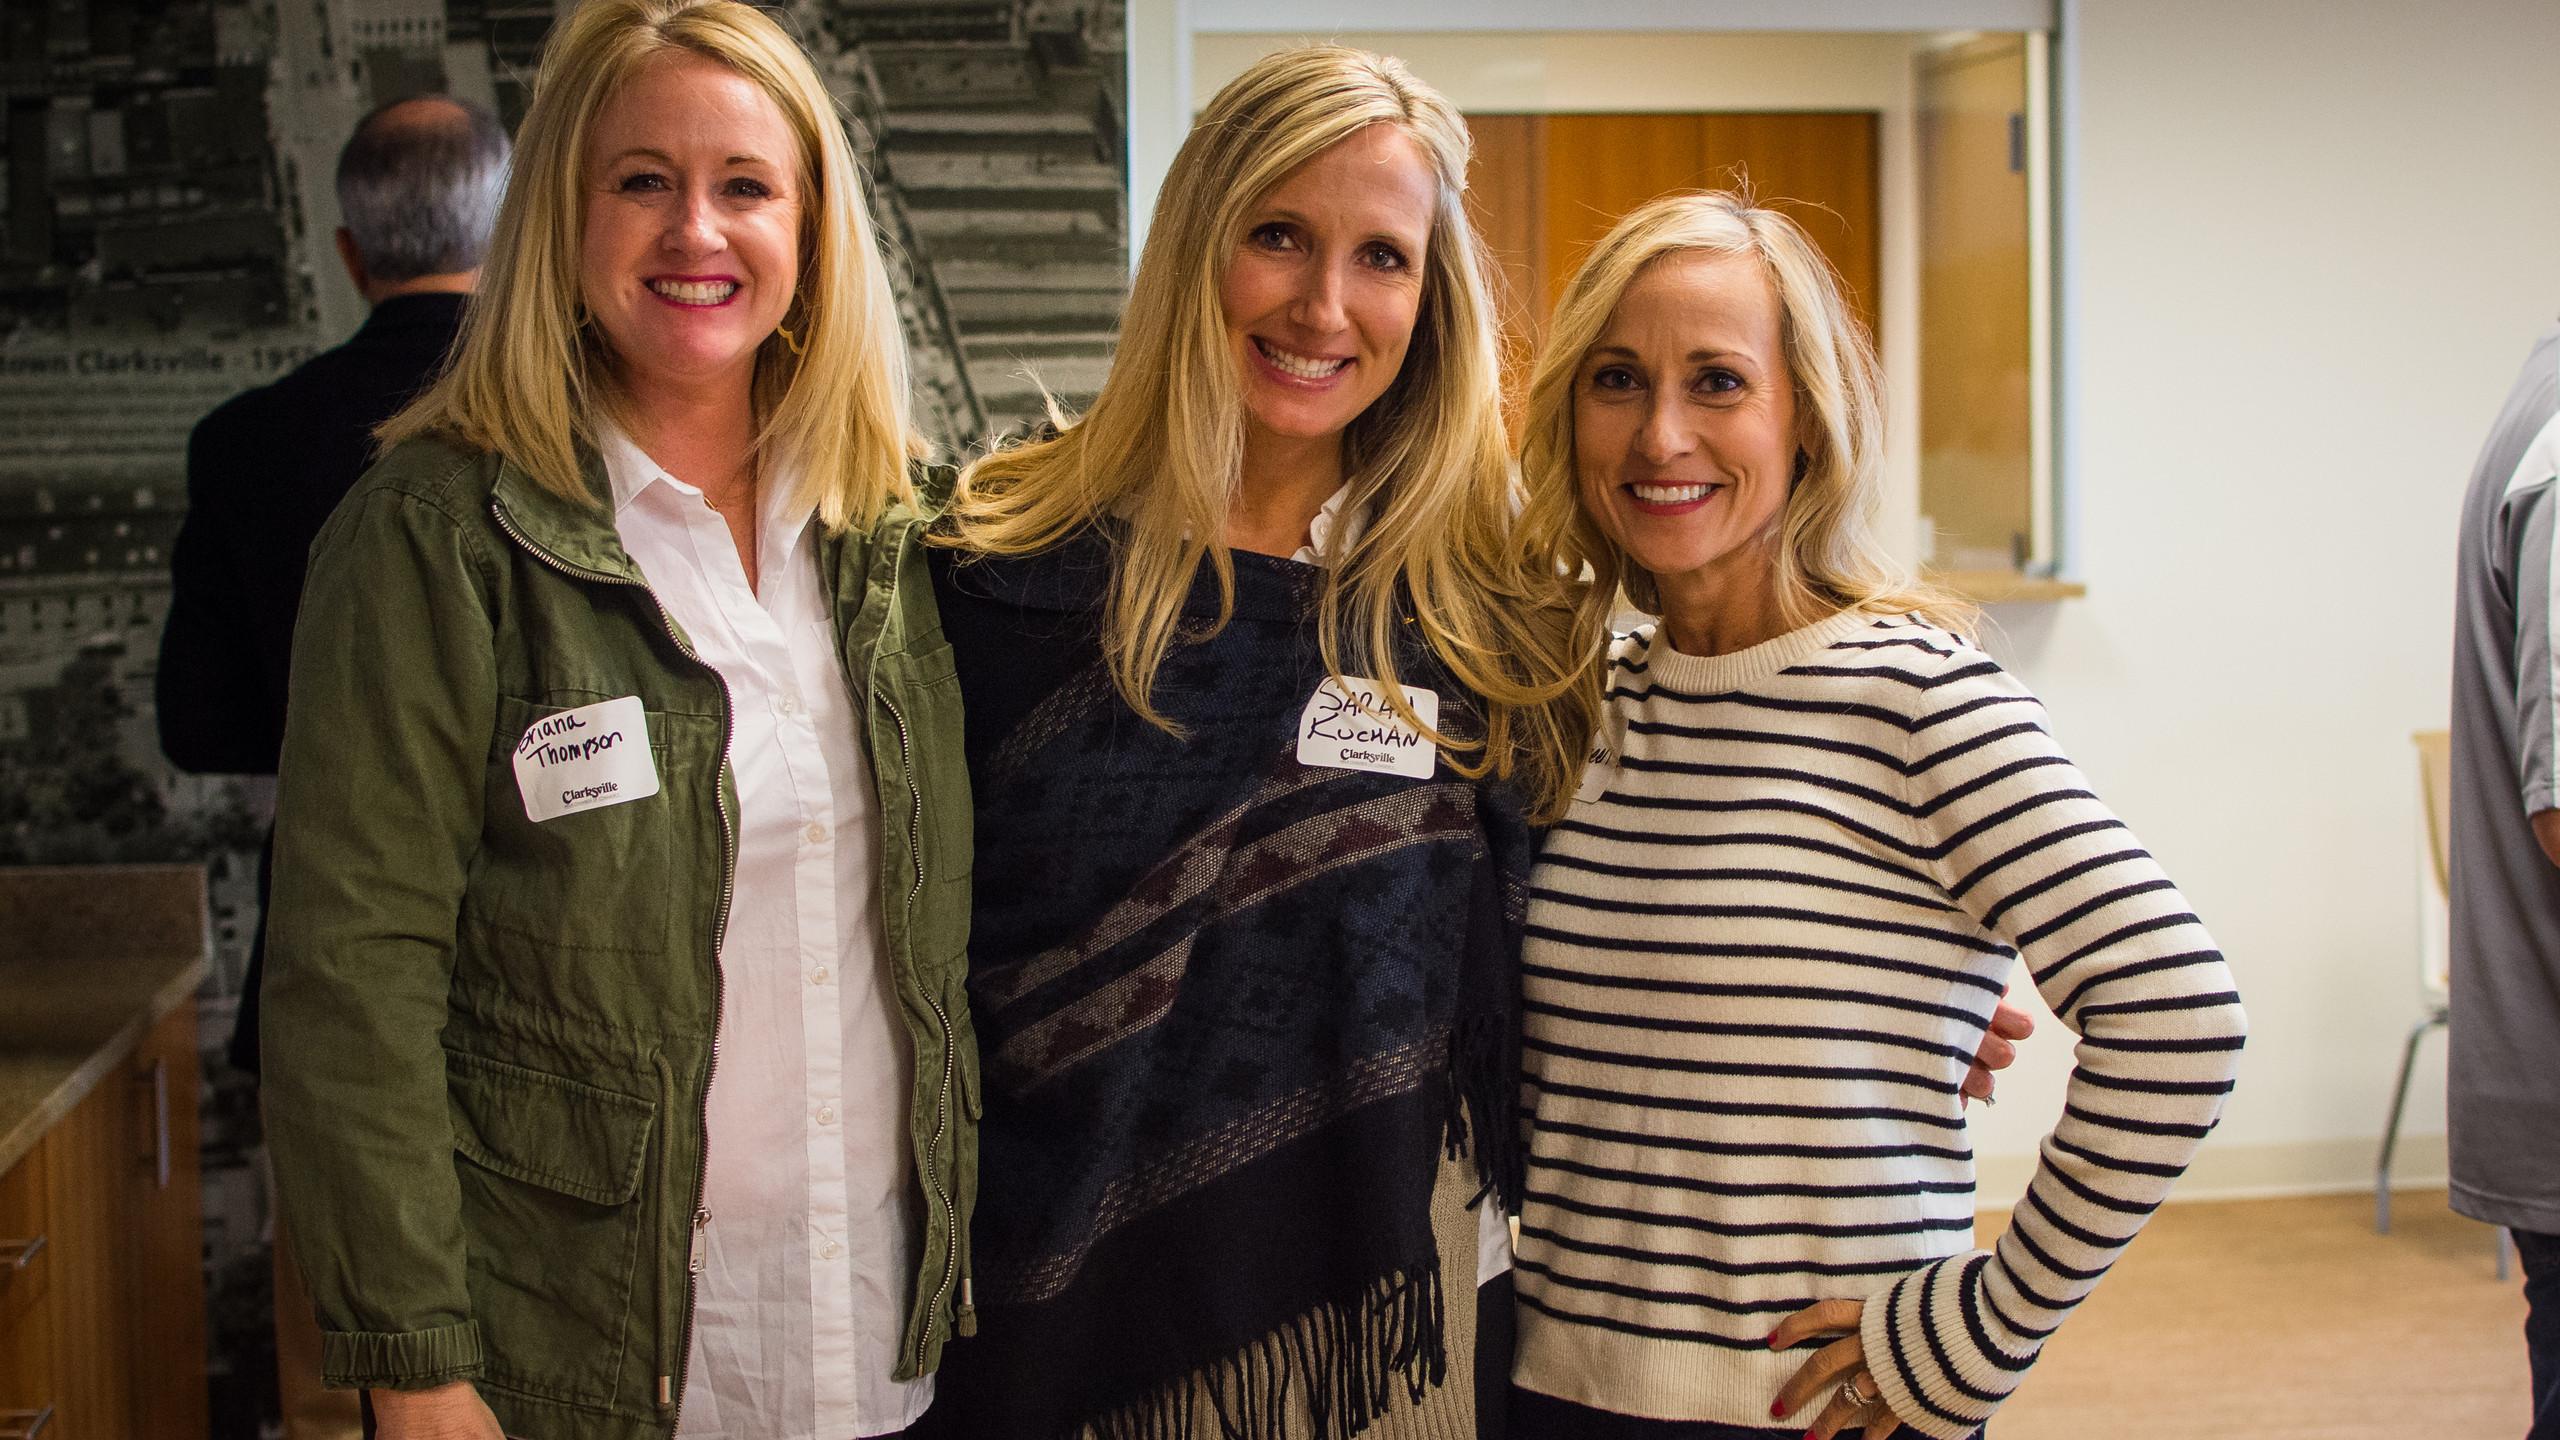 Brianna Thompson, Sarah Kuchan, and Moll